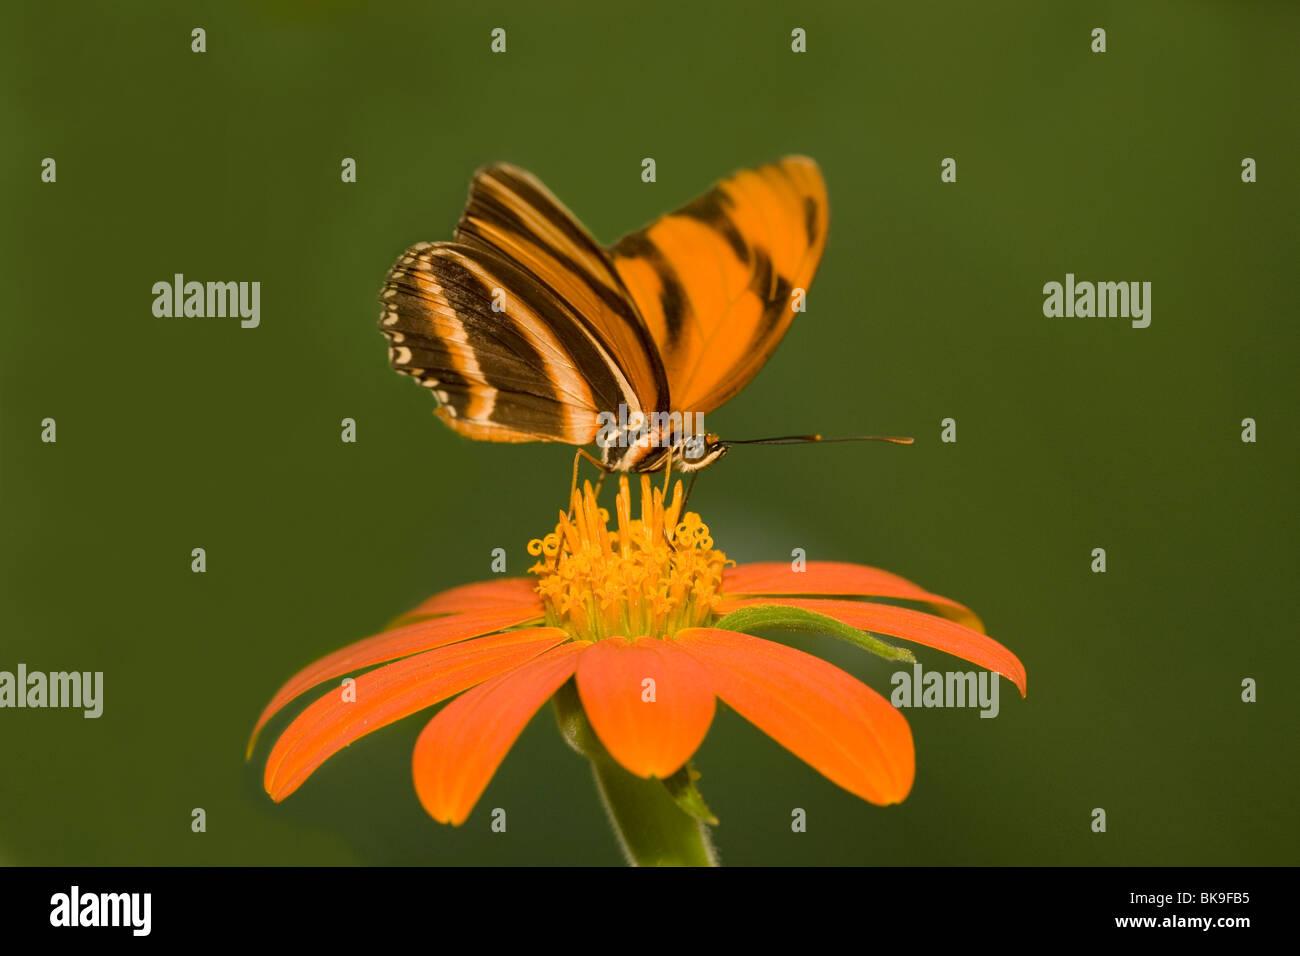 Naranja con bandas Heliconian butterfly (Dryadula phaetusa) polinizando una flor Imagen De Stock